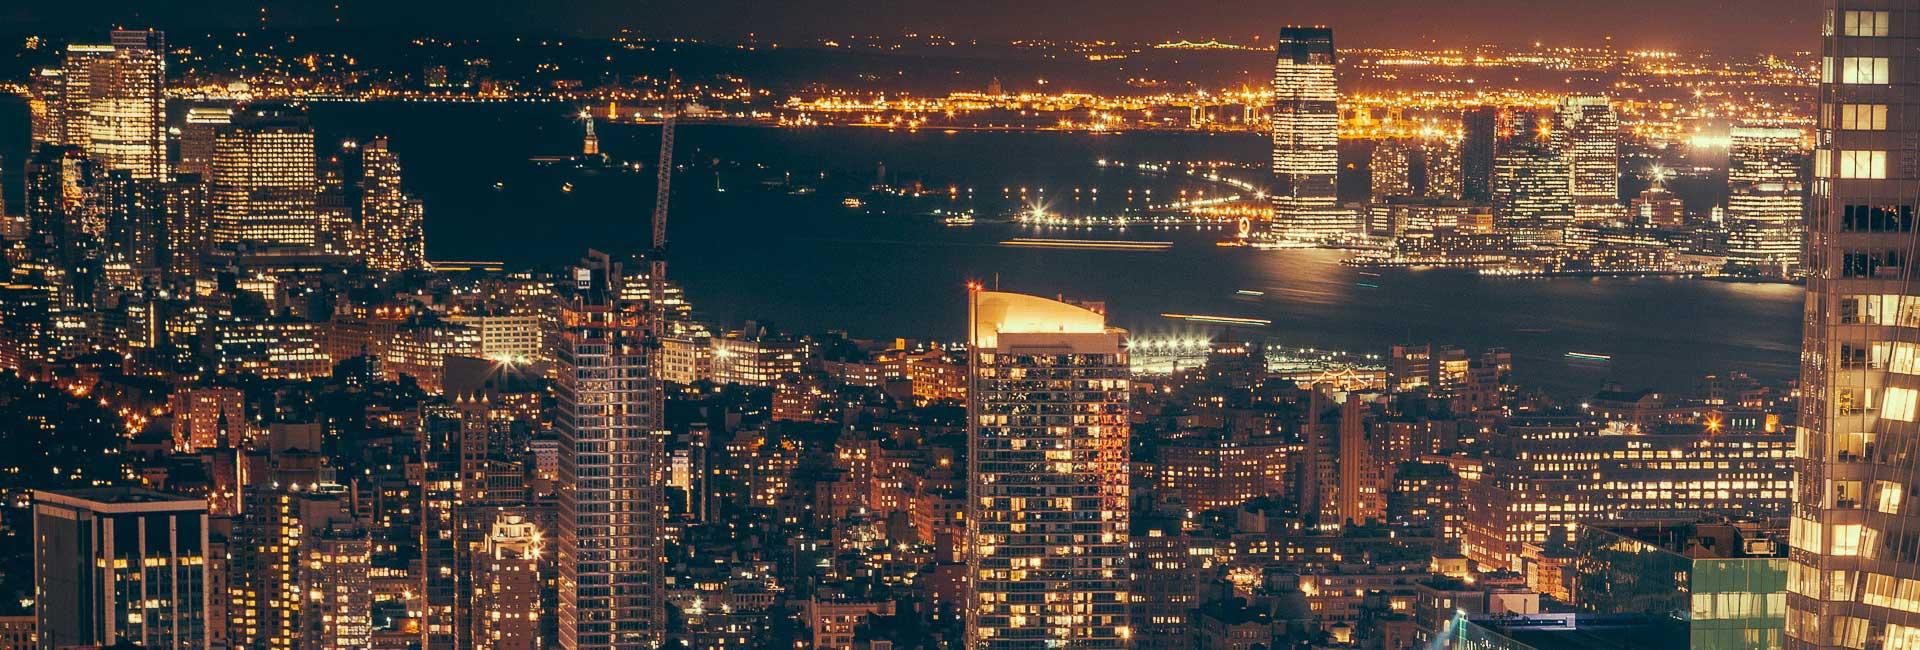 Energías renovables reto electrificación del mundo - Capital Nostrum